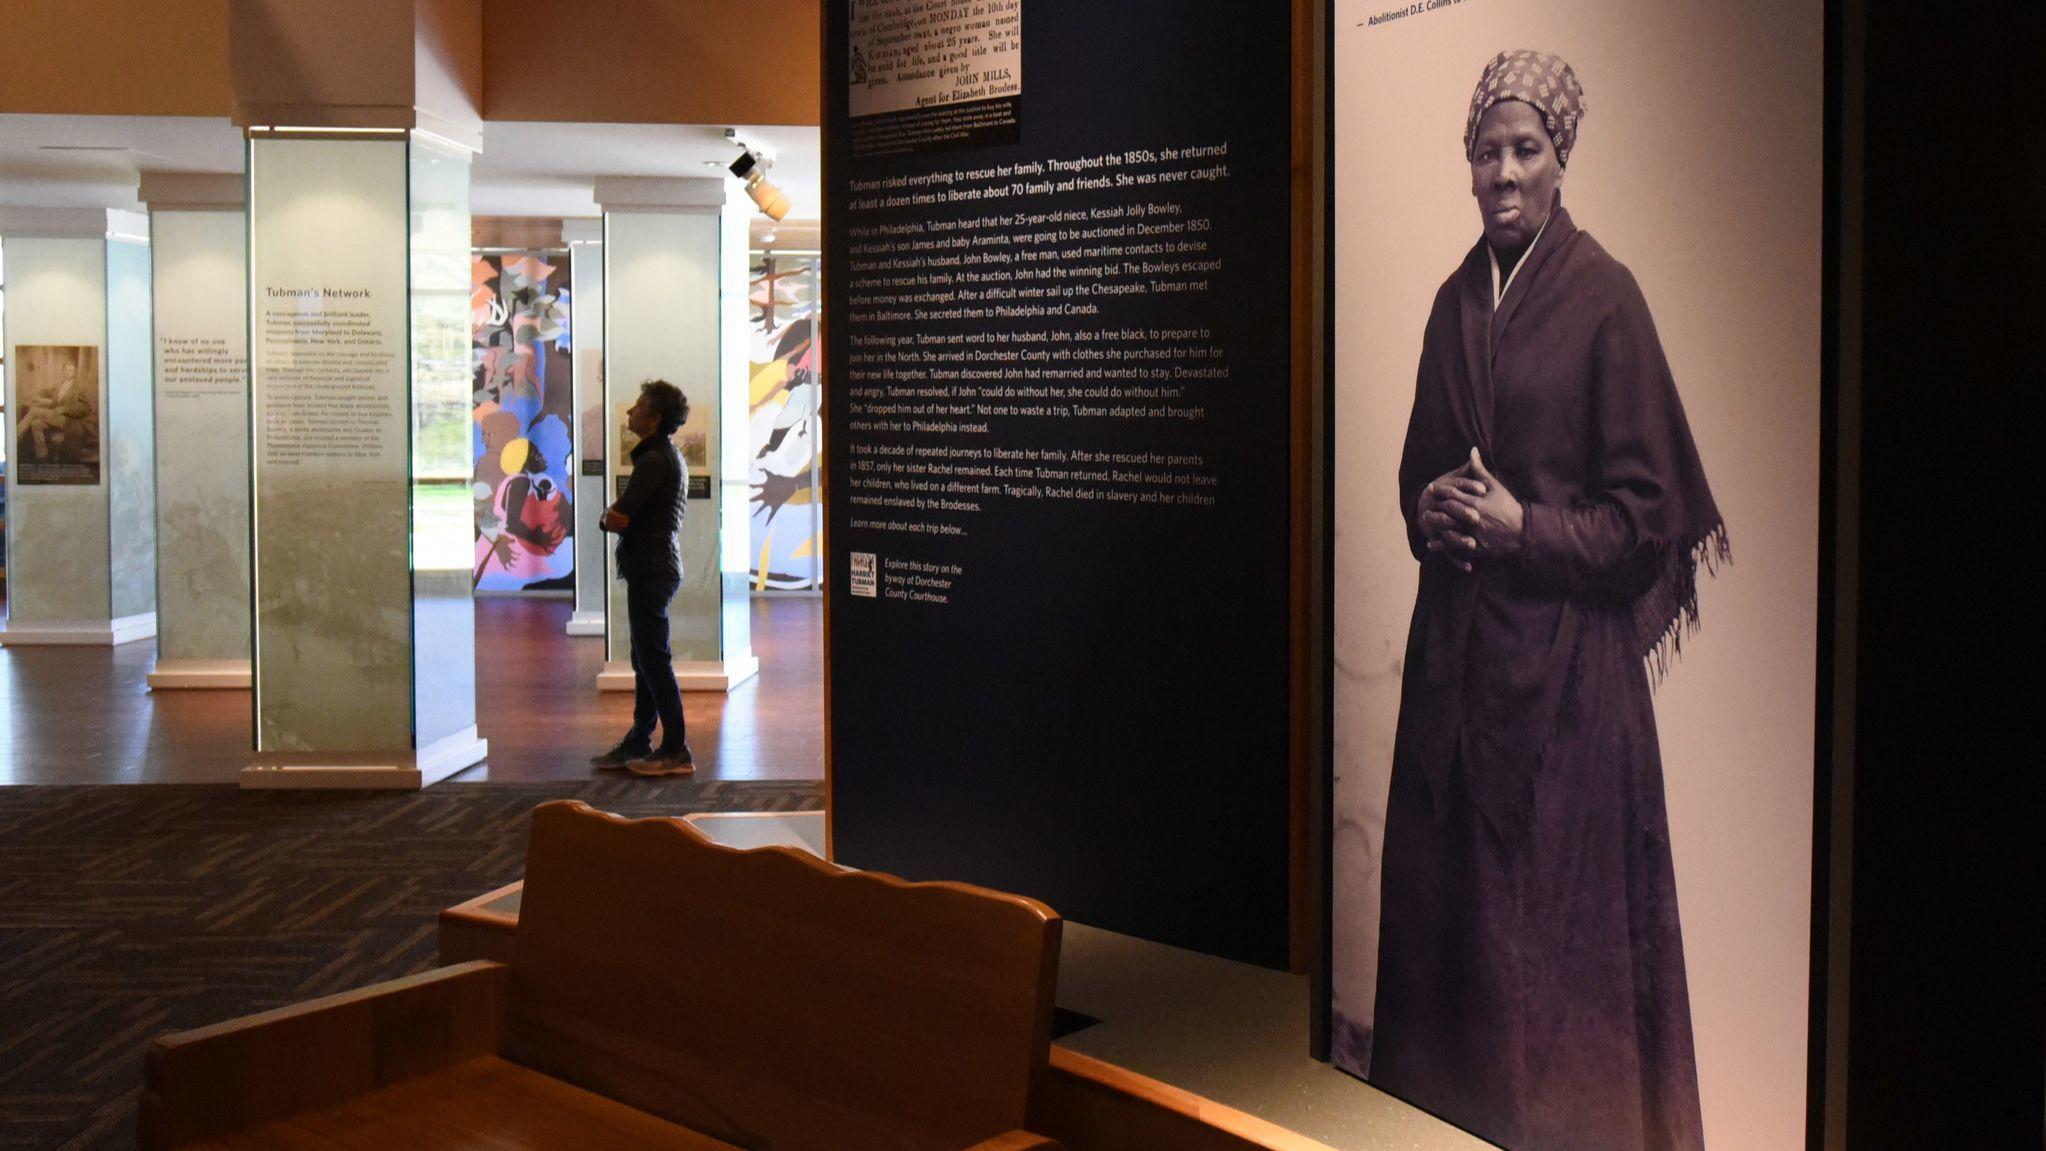 Harriet Tubman $20 bill likely won't happen until 2026, Treasury secretary says; Shaheen criticizes delay